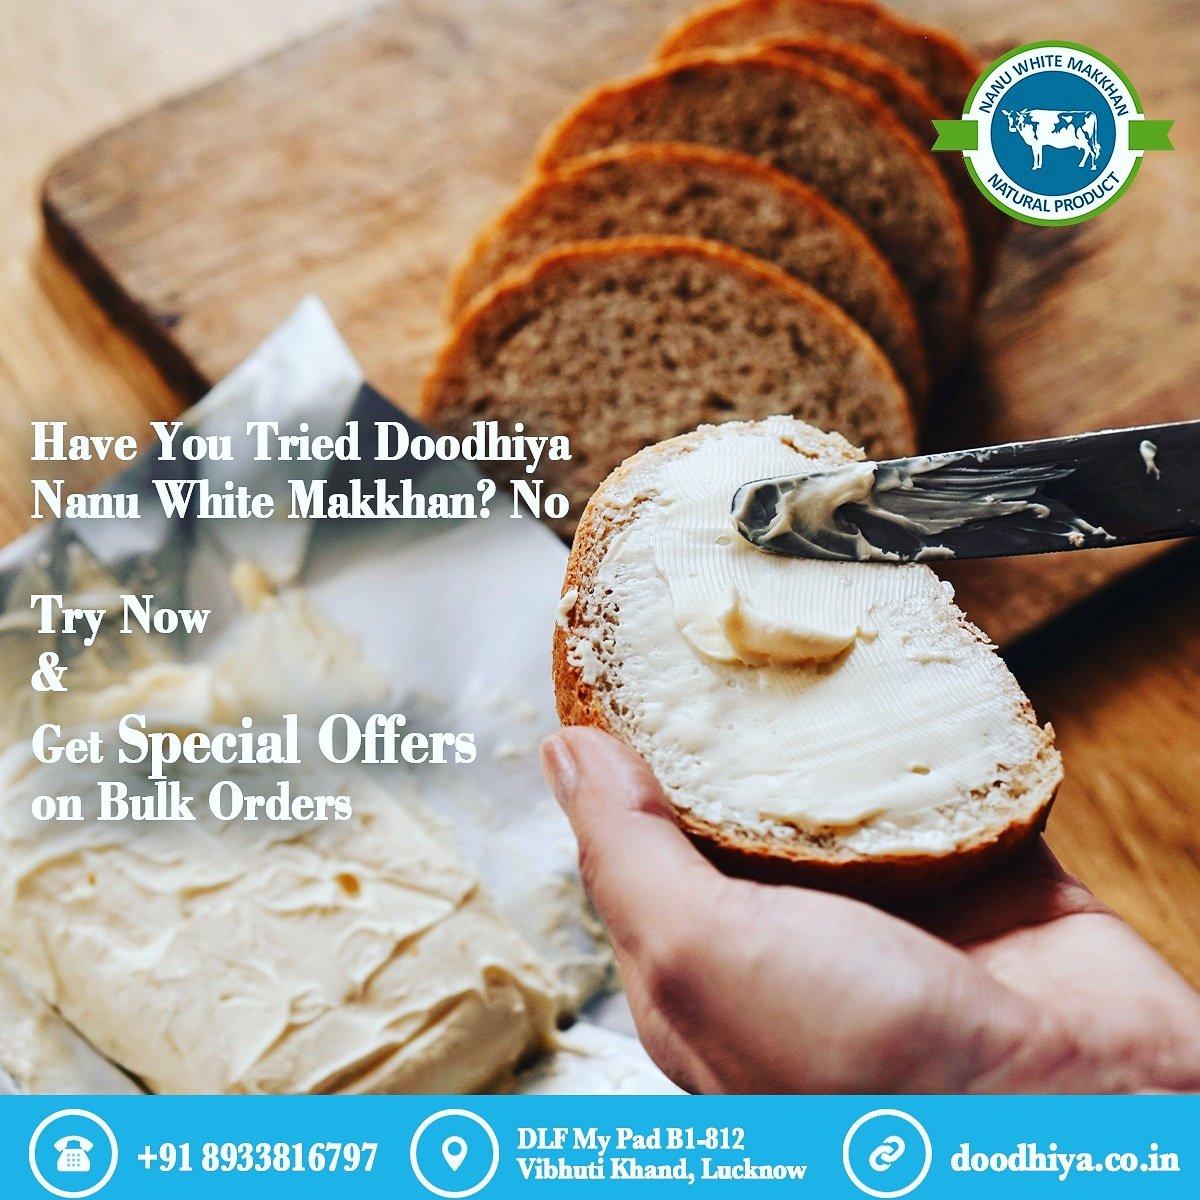 Have you tried yet Doodhiya Nanu White Makkhan?  #dairy #farm #milk #lucknow #doodhiya #likes #likeforlikes #followme #follow4followback #followforfollowback #comment #naturalmilk #deliciousmilk #organicmilk #healthymilk